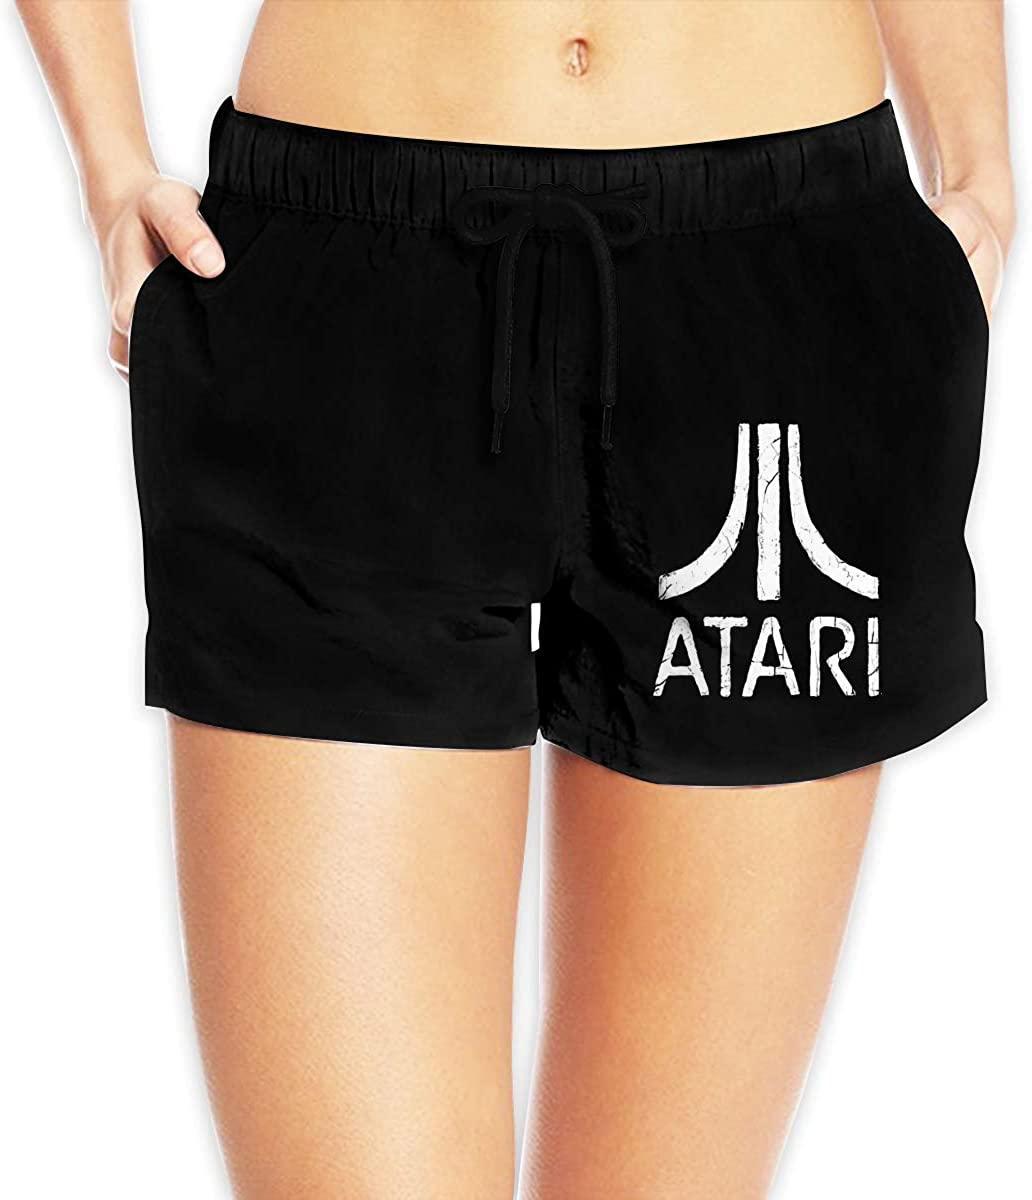 Women Sexy Hot Pants Summer Casual Shorts Atari Short Beach Trousers